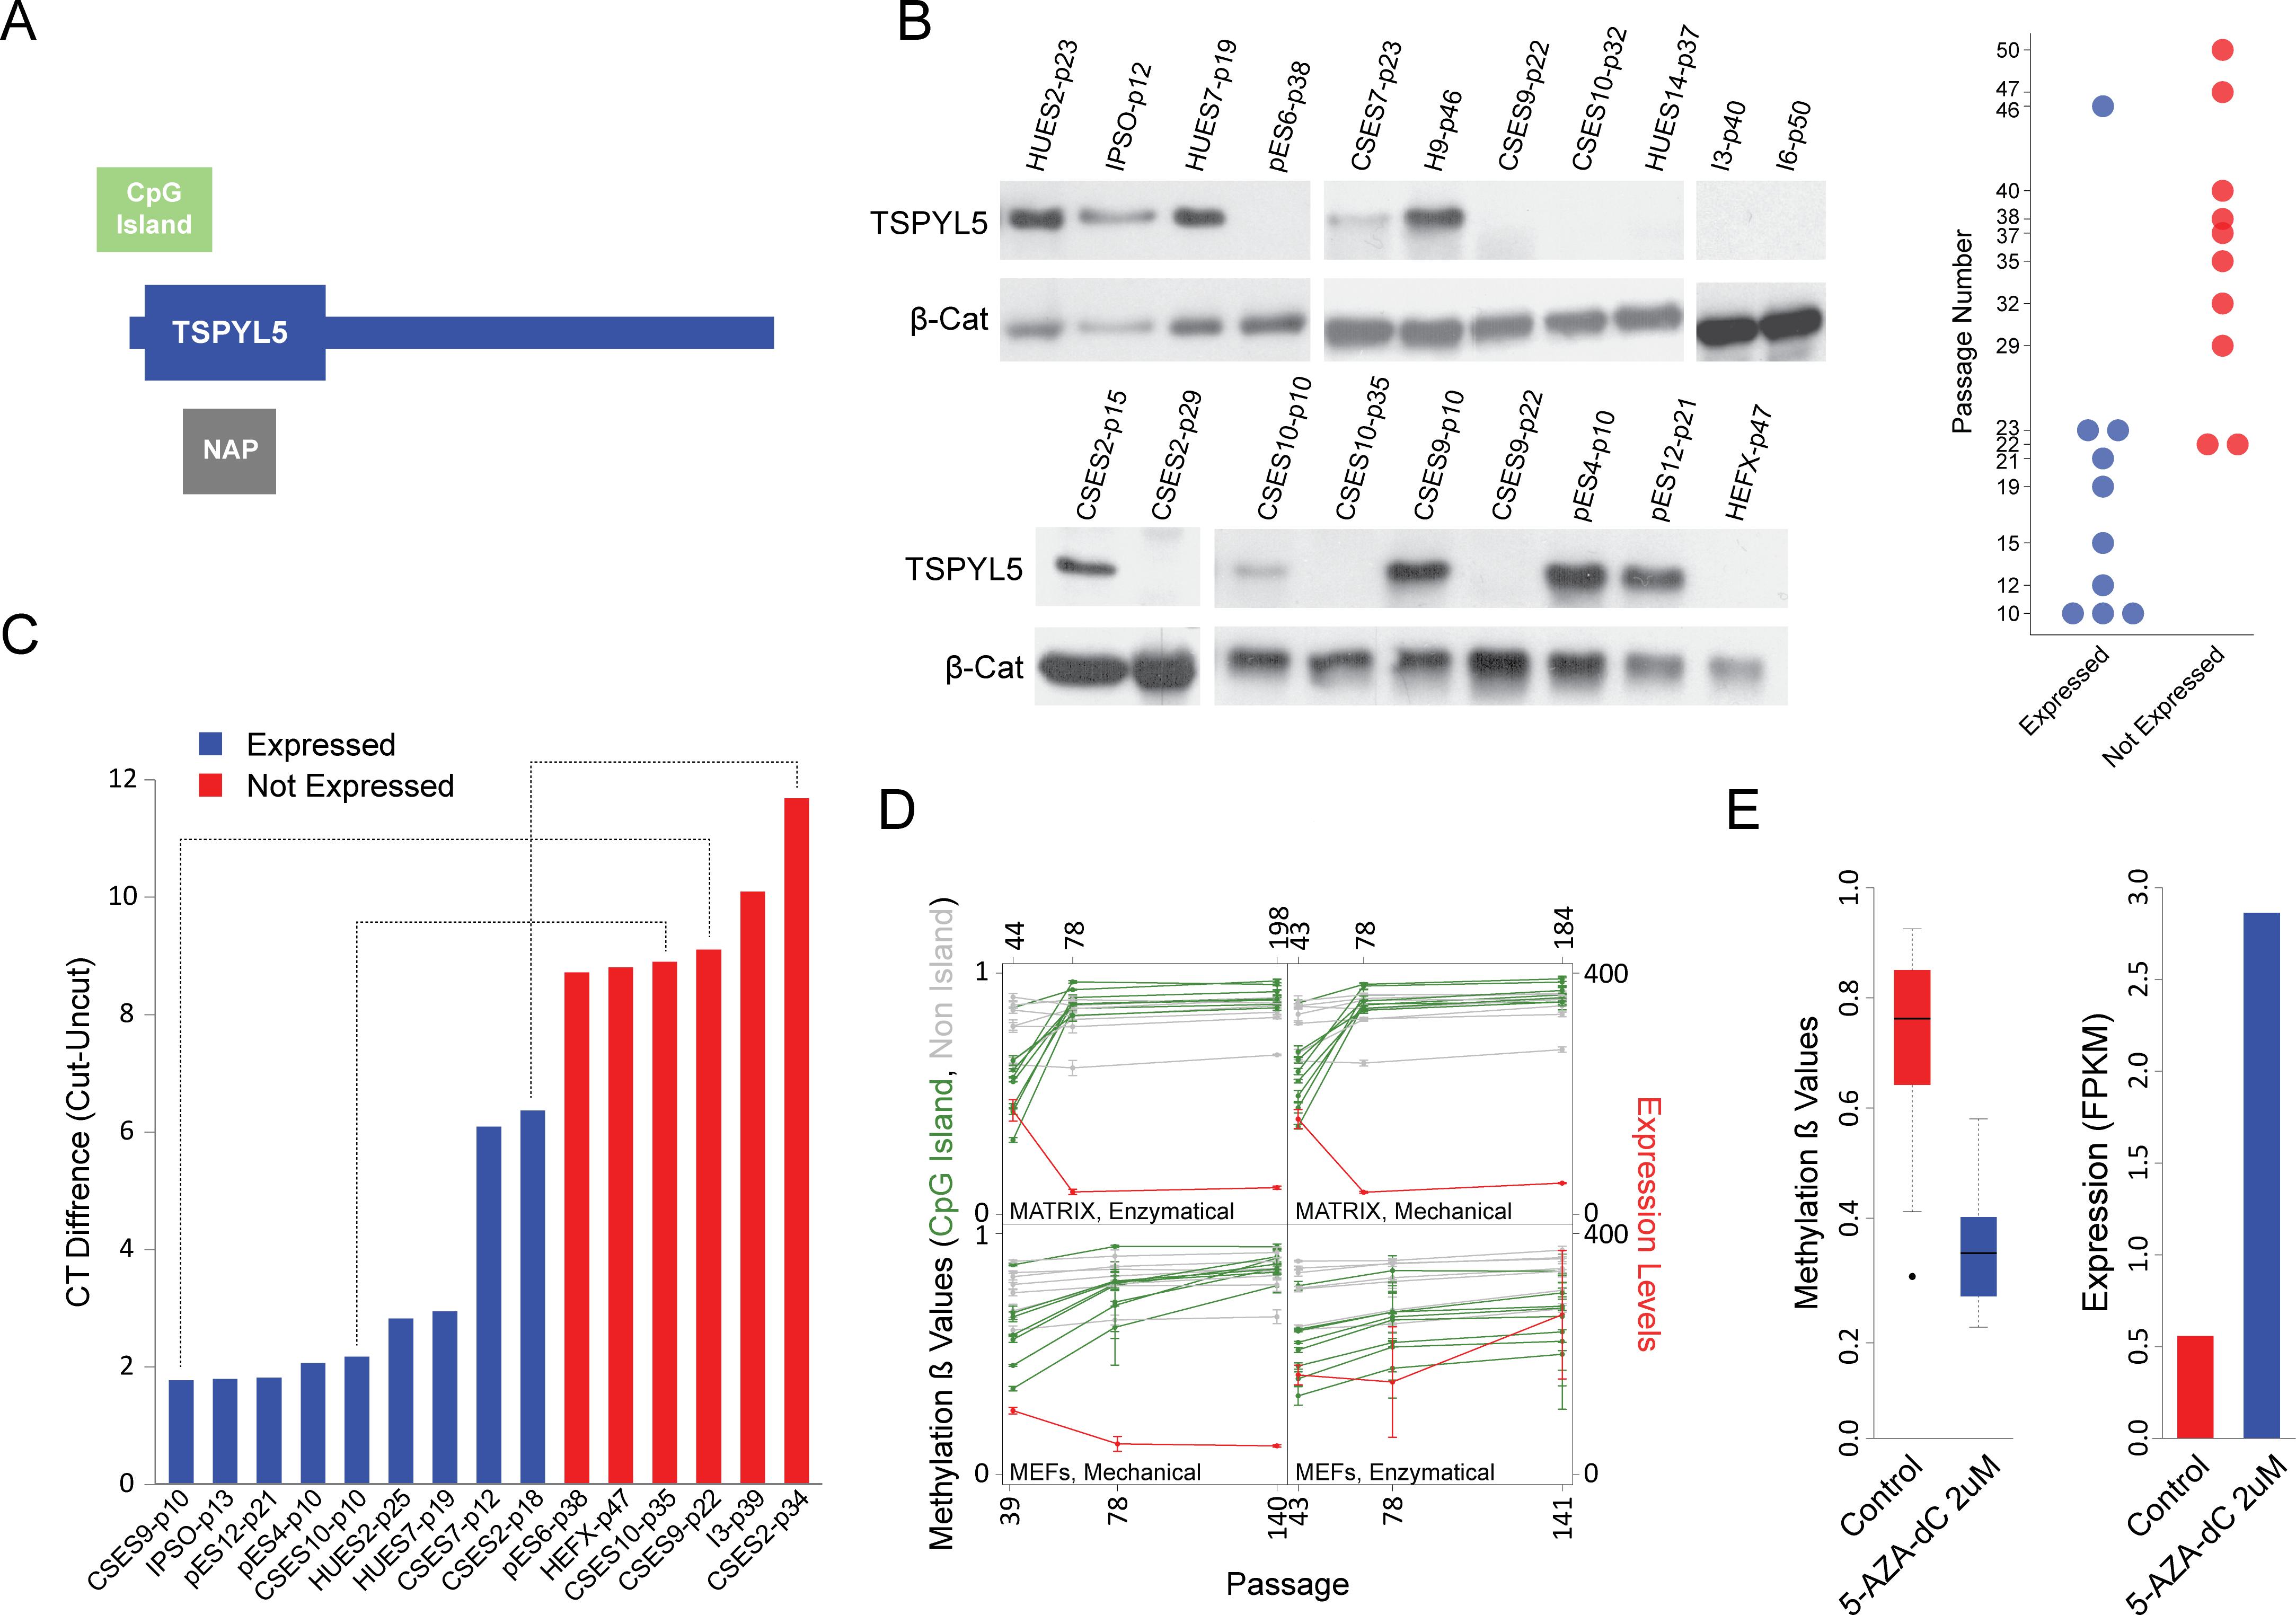 <i>TSPYL5</i> undergoes hyper methylation and silencing in culture.